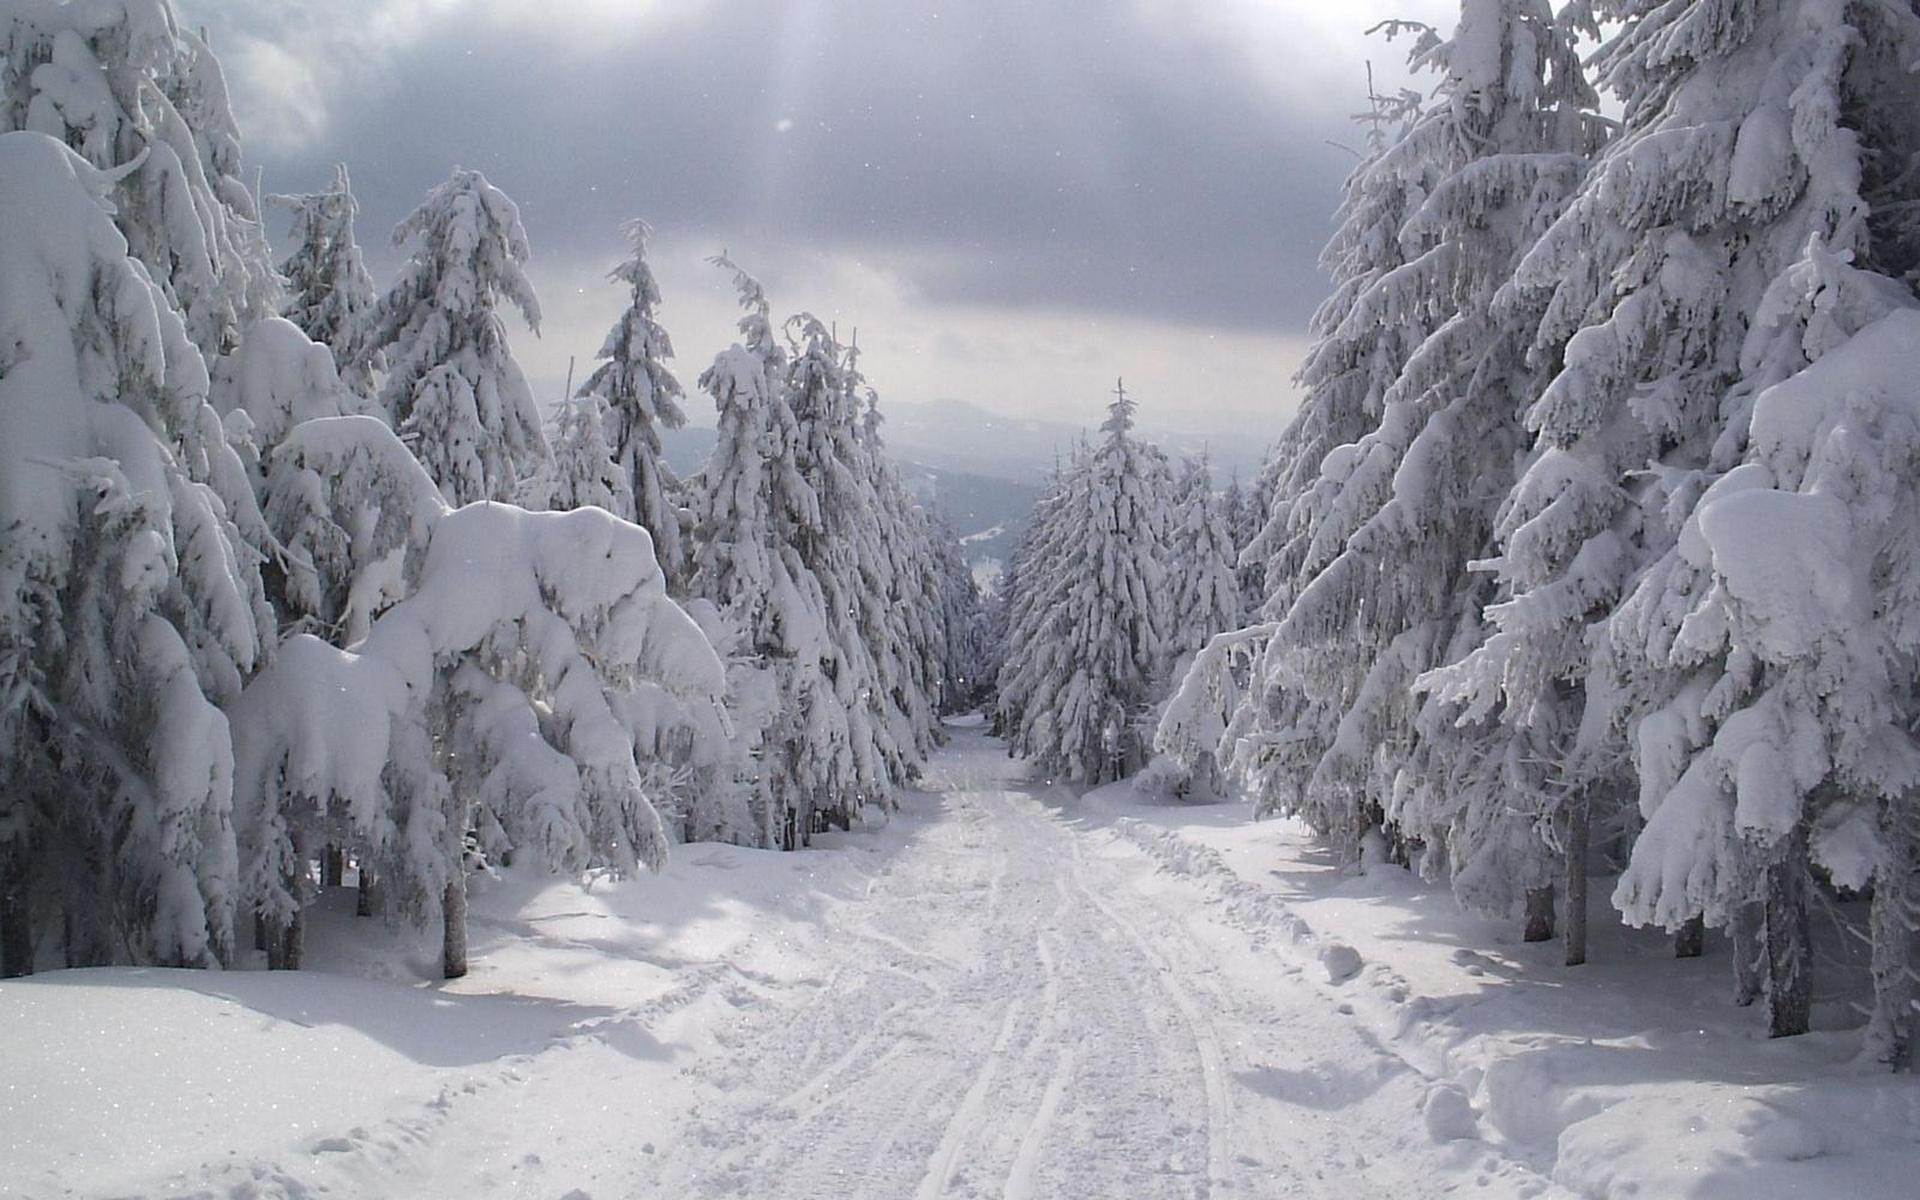 Sfondi neve 50 immagini for Paesaggi invernali per desktop